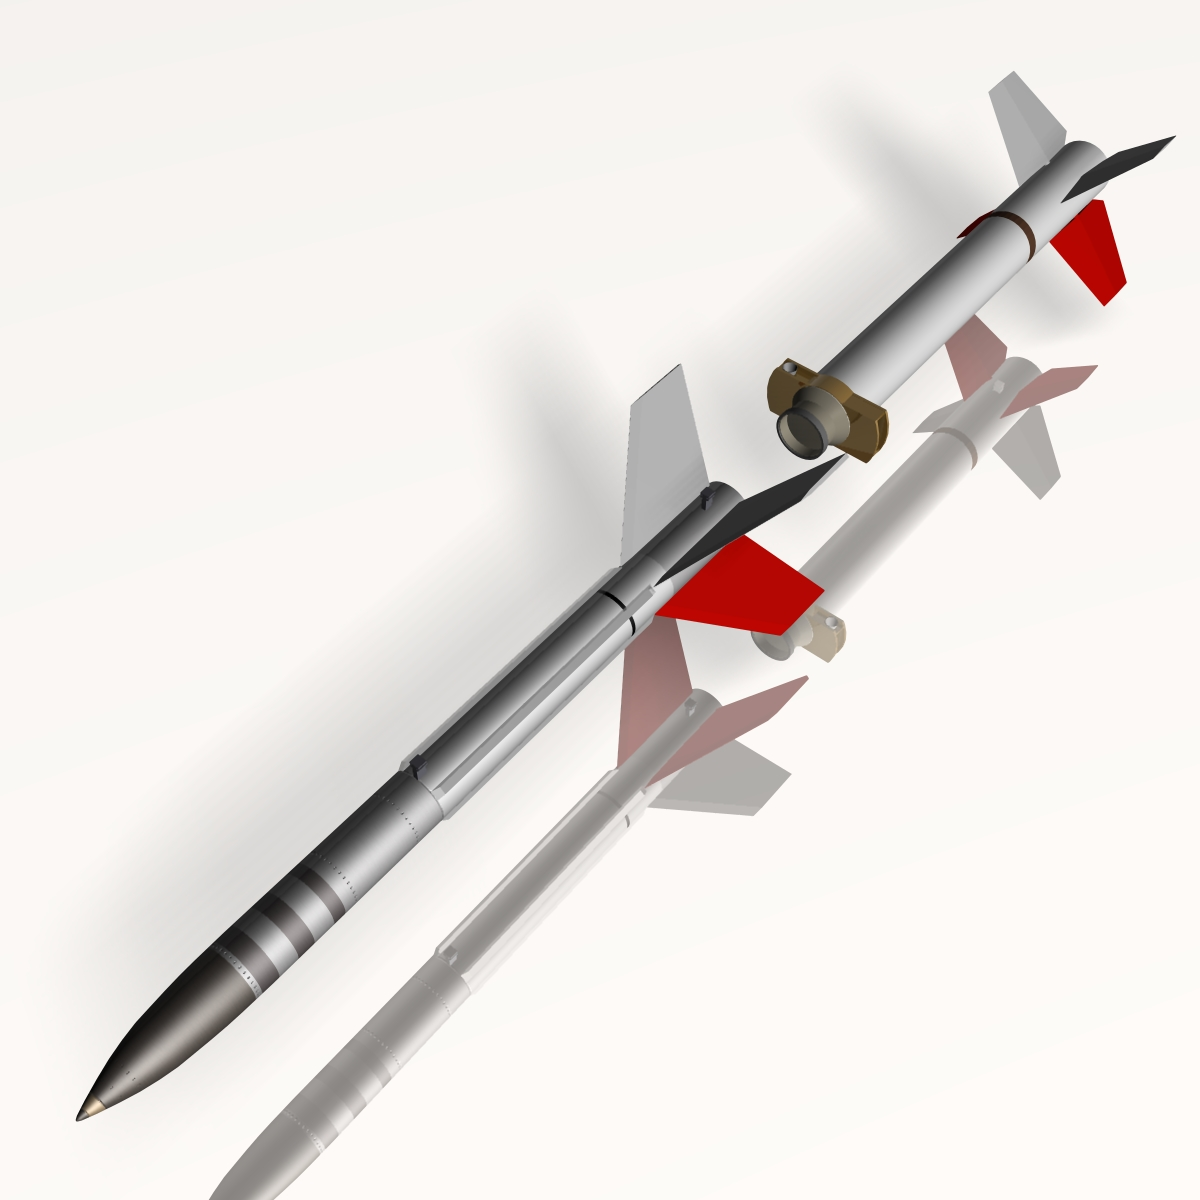 us terrier-lynx rocket 3d model 3ds dxf cob x obj 140329